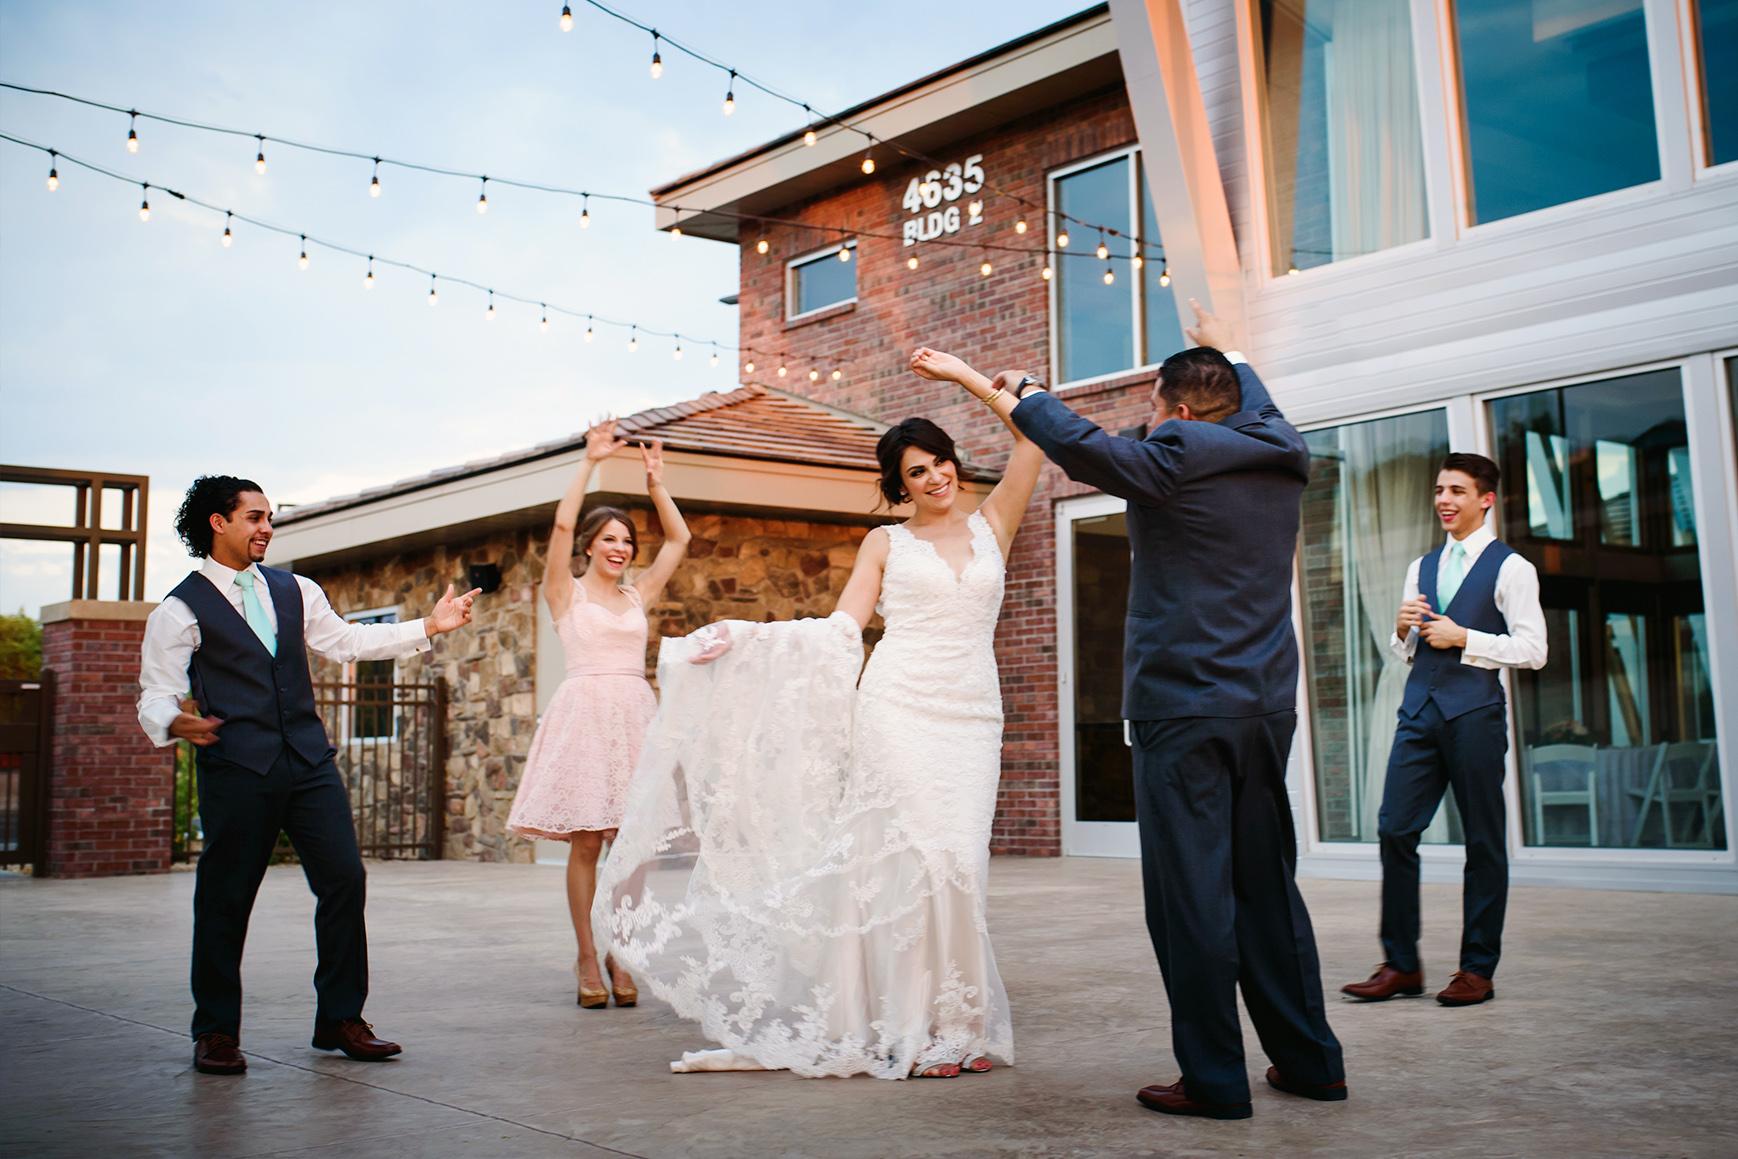 Wedding reception dancing - Colby Falls - Gilbert, Arizona - Maricopa County - Wedgewood Weddings